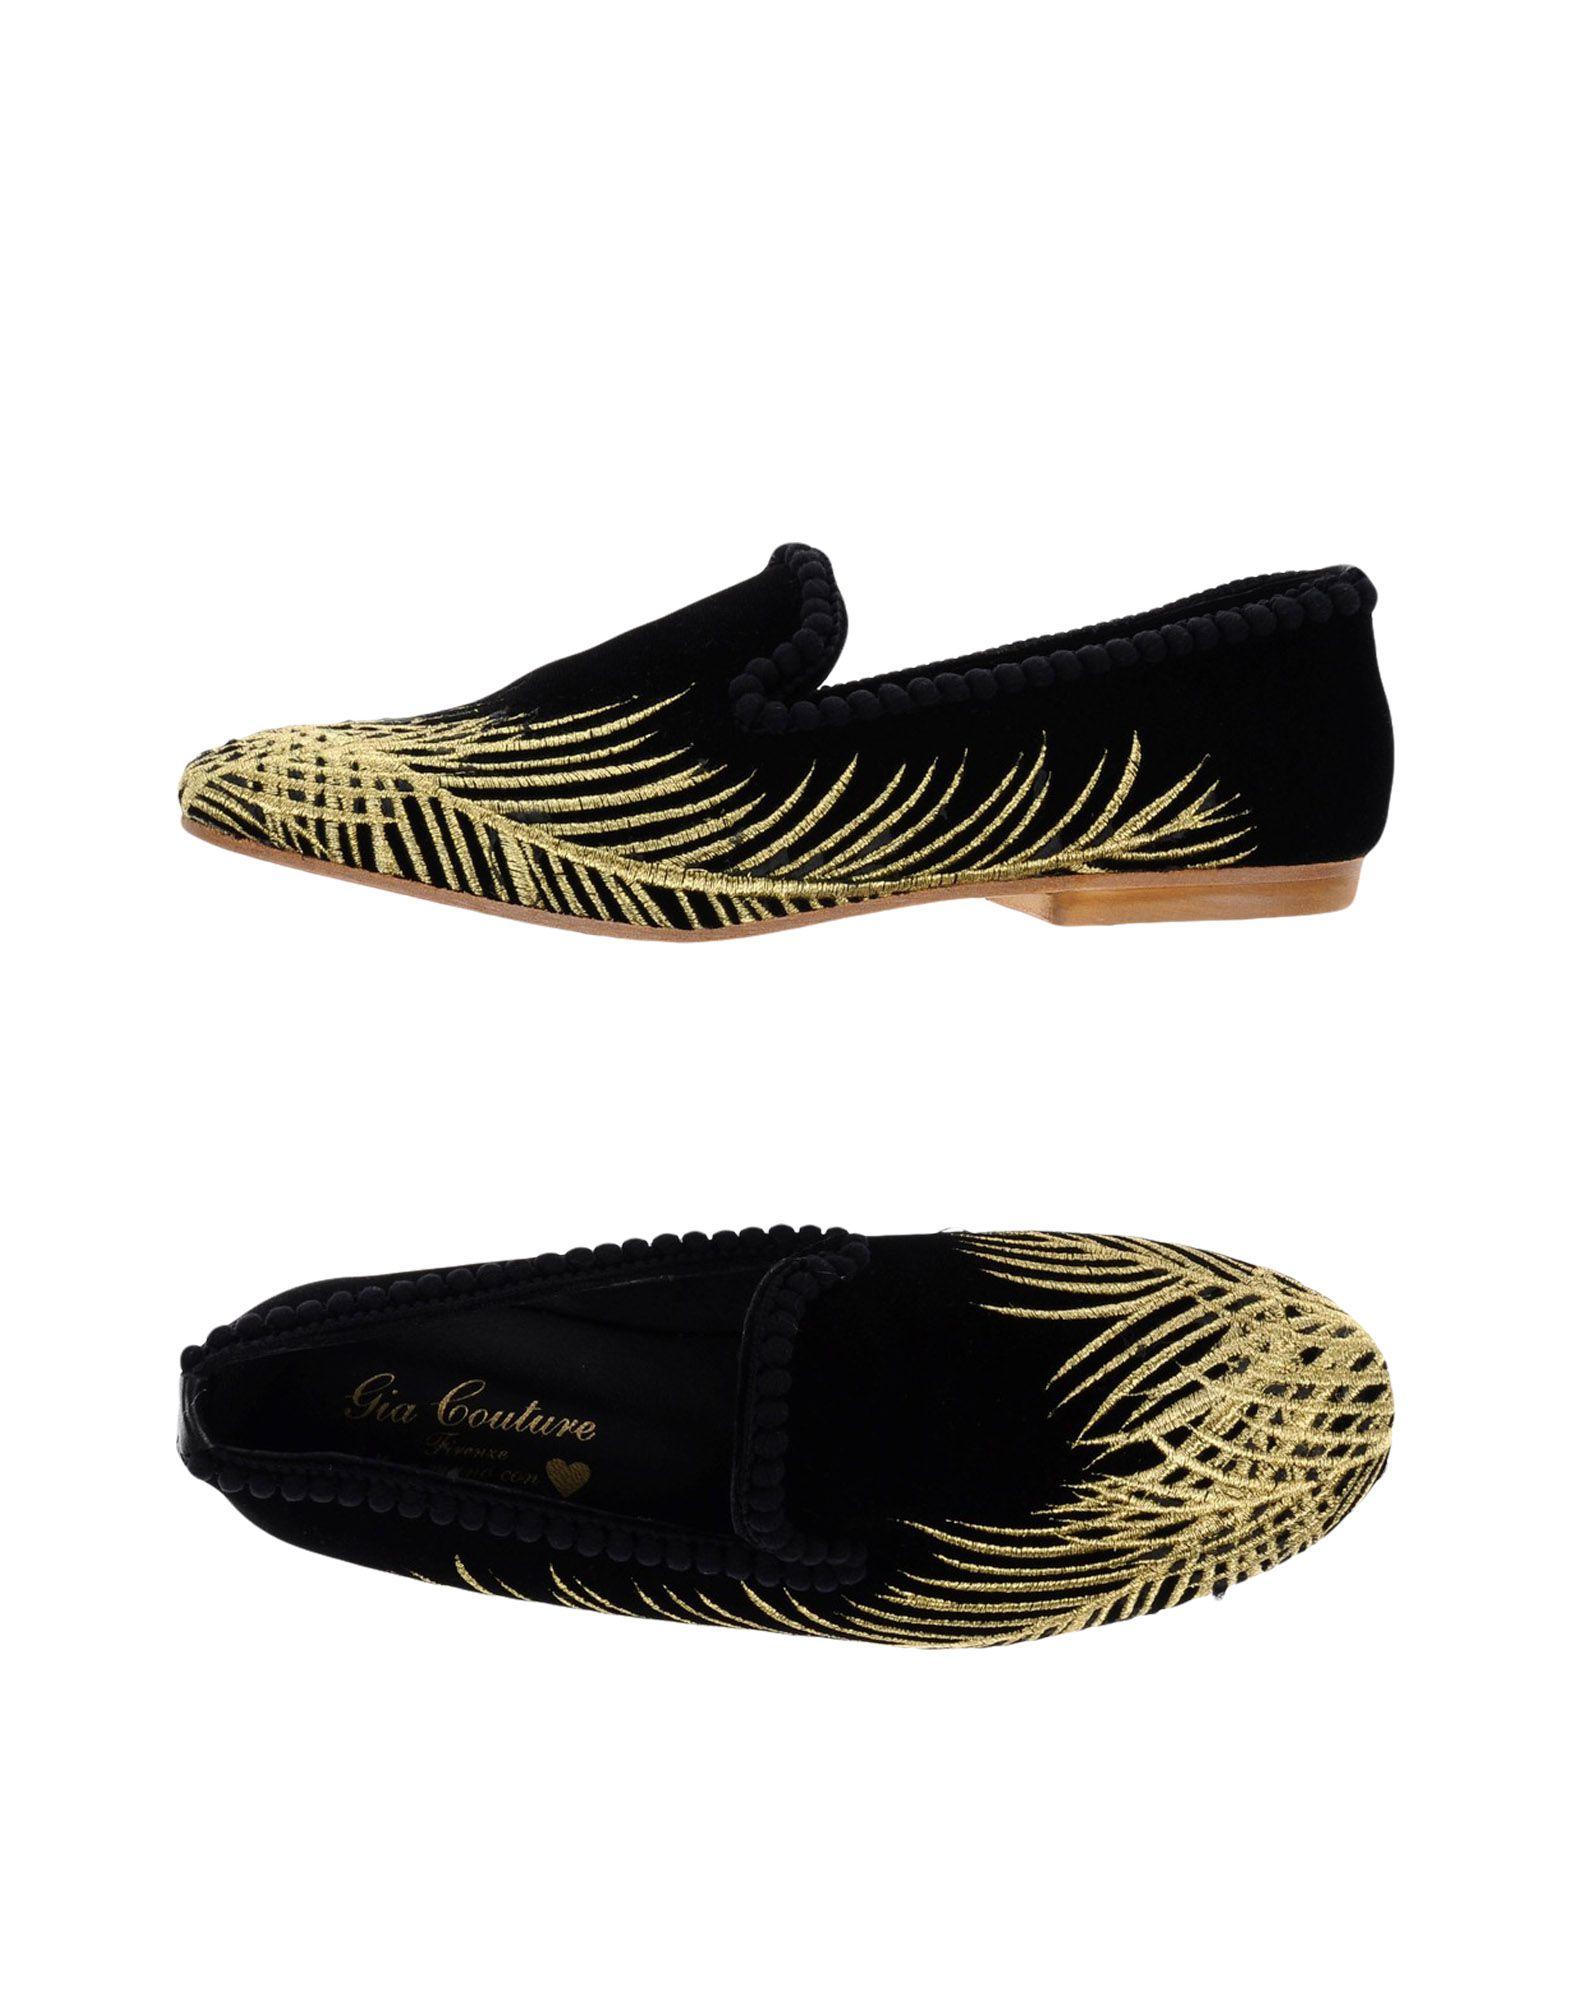 Gia Couture Mokassins Damen  11265630VCGut aussehende strapazierfähige Schuhe